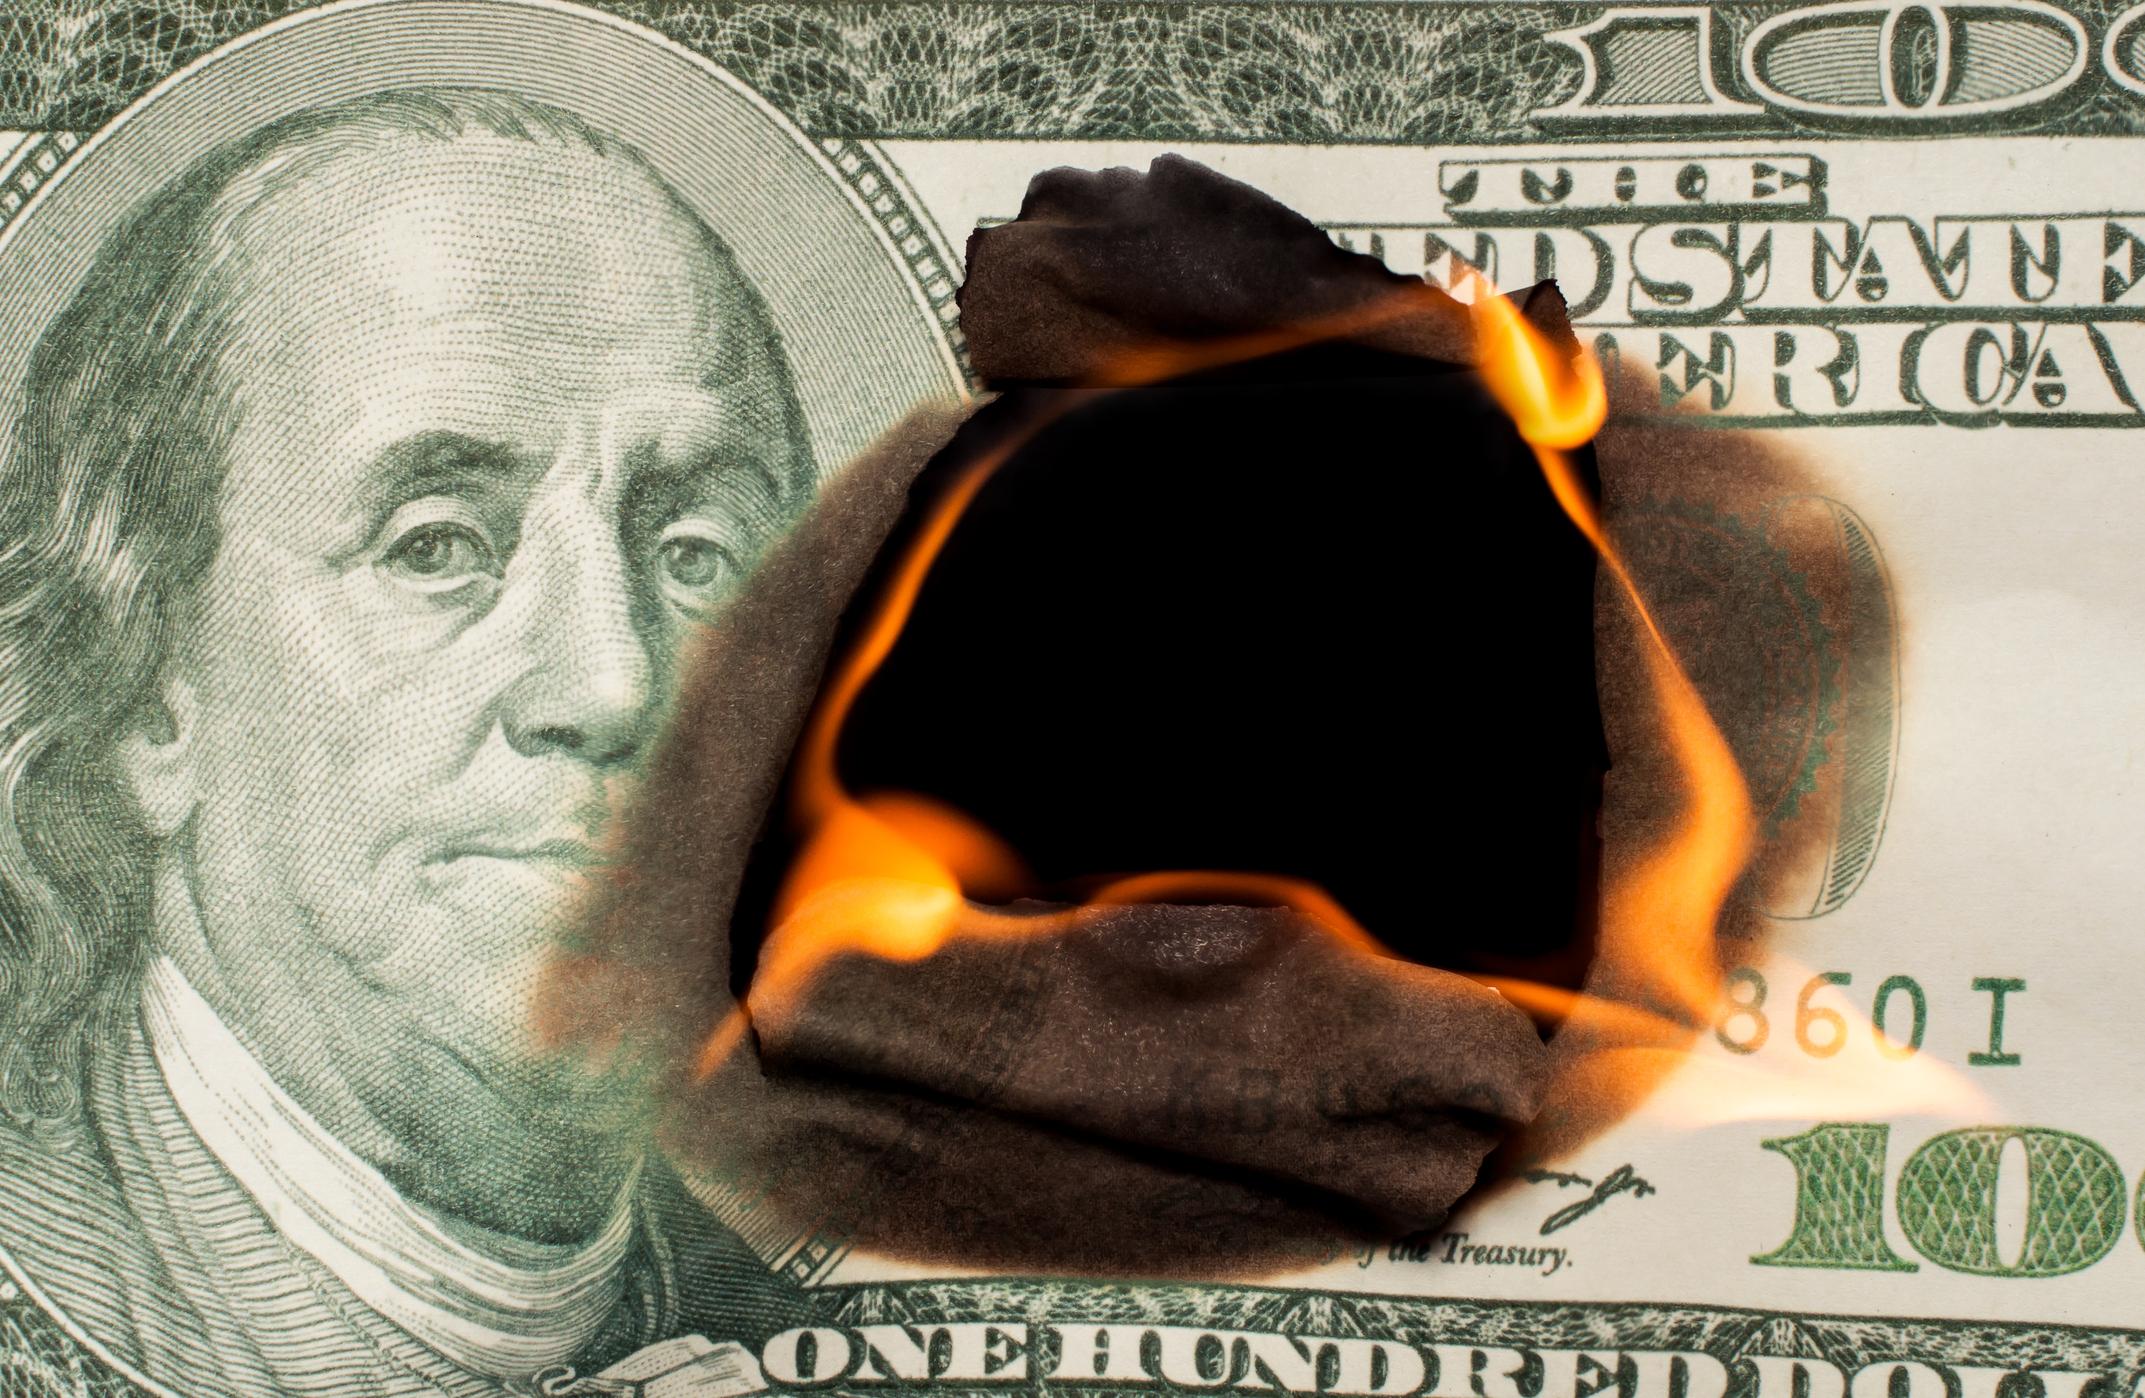 A hundred dollar bill burning from the inside outward.